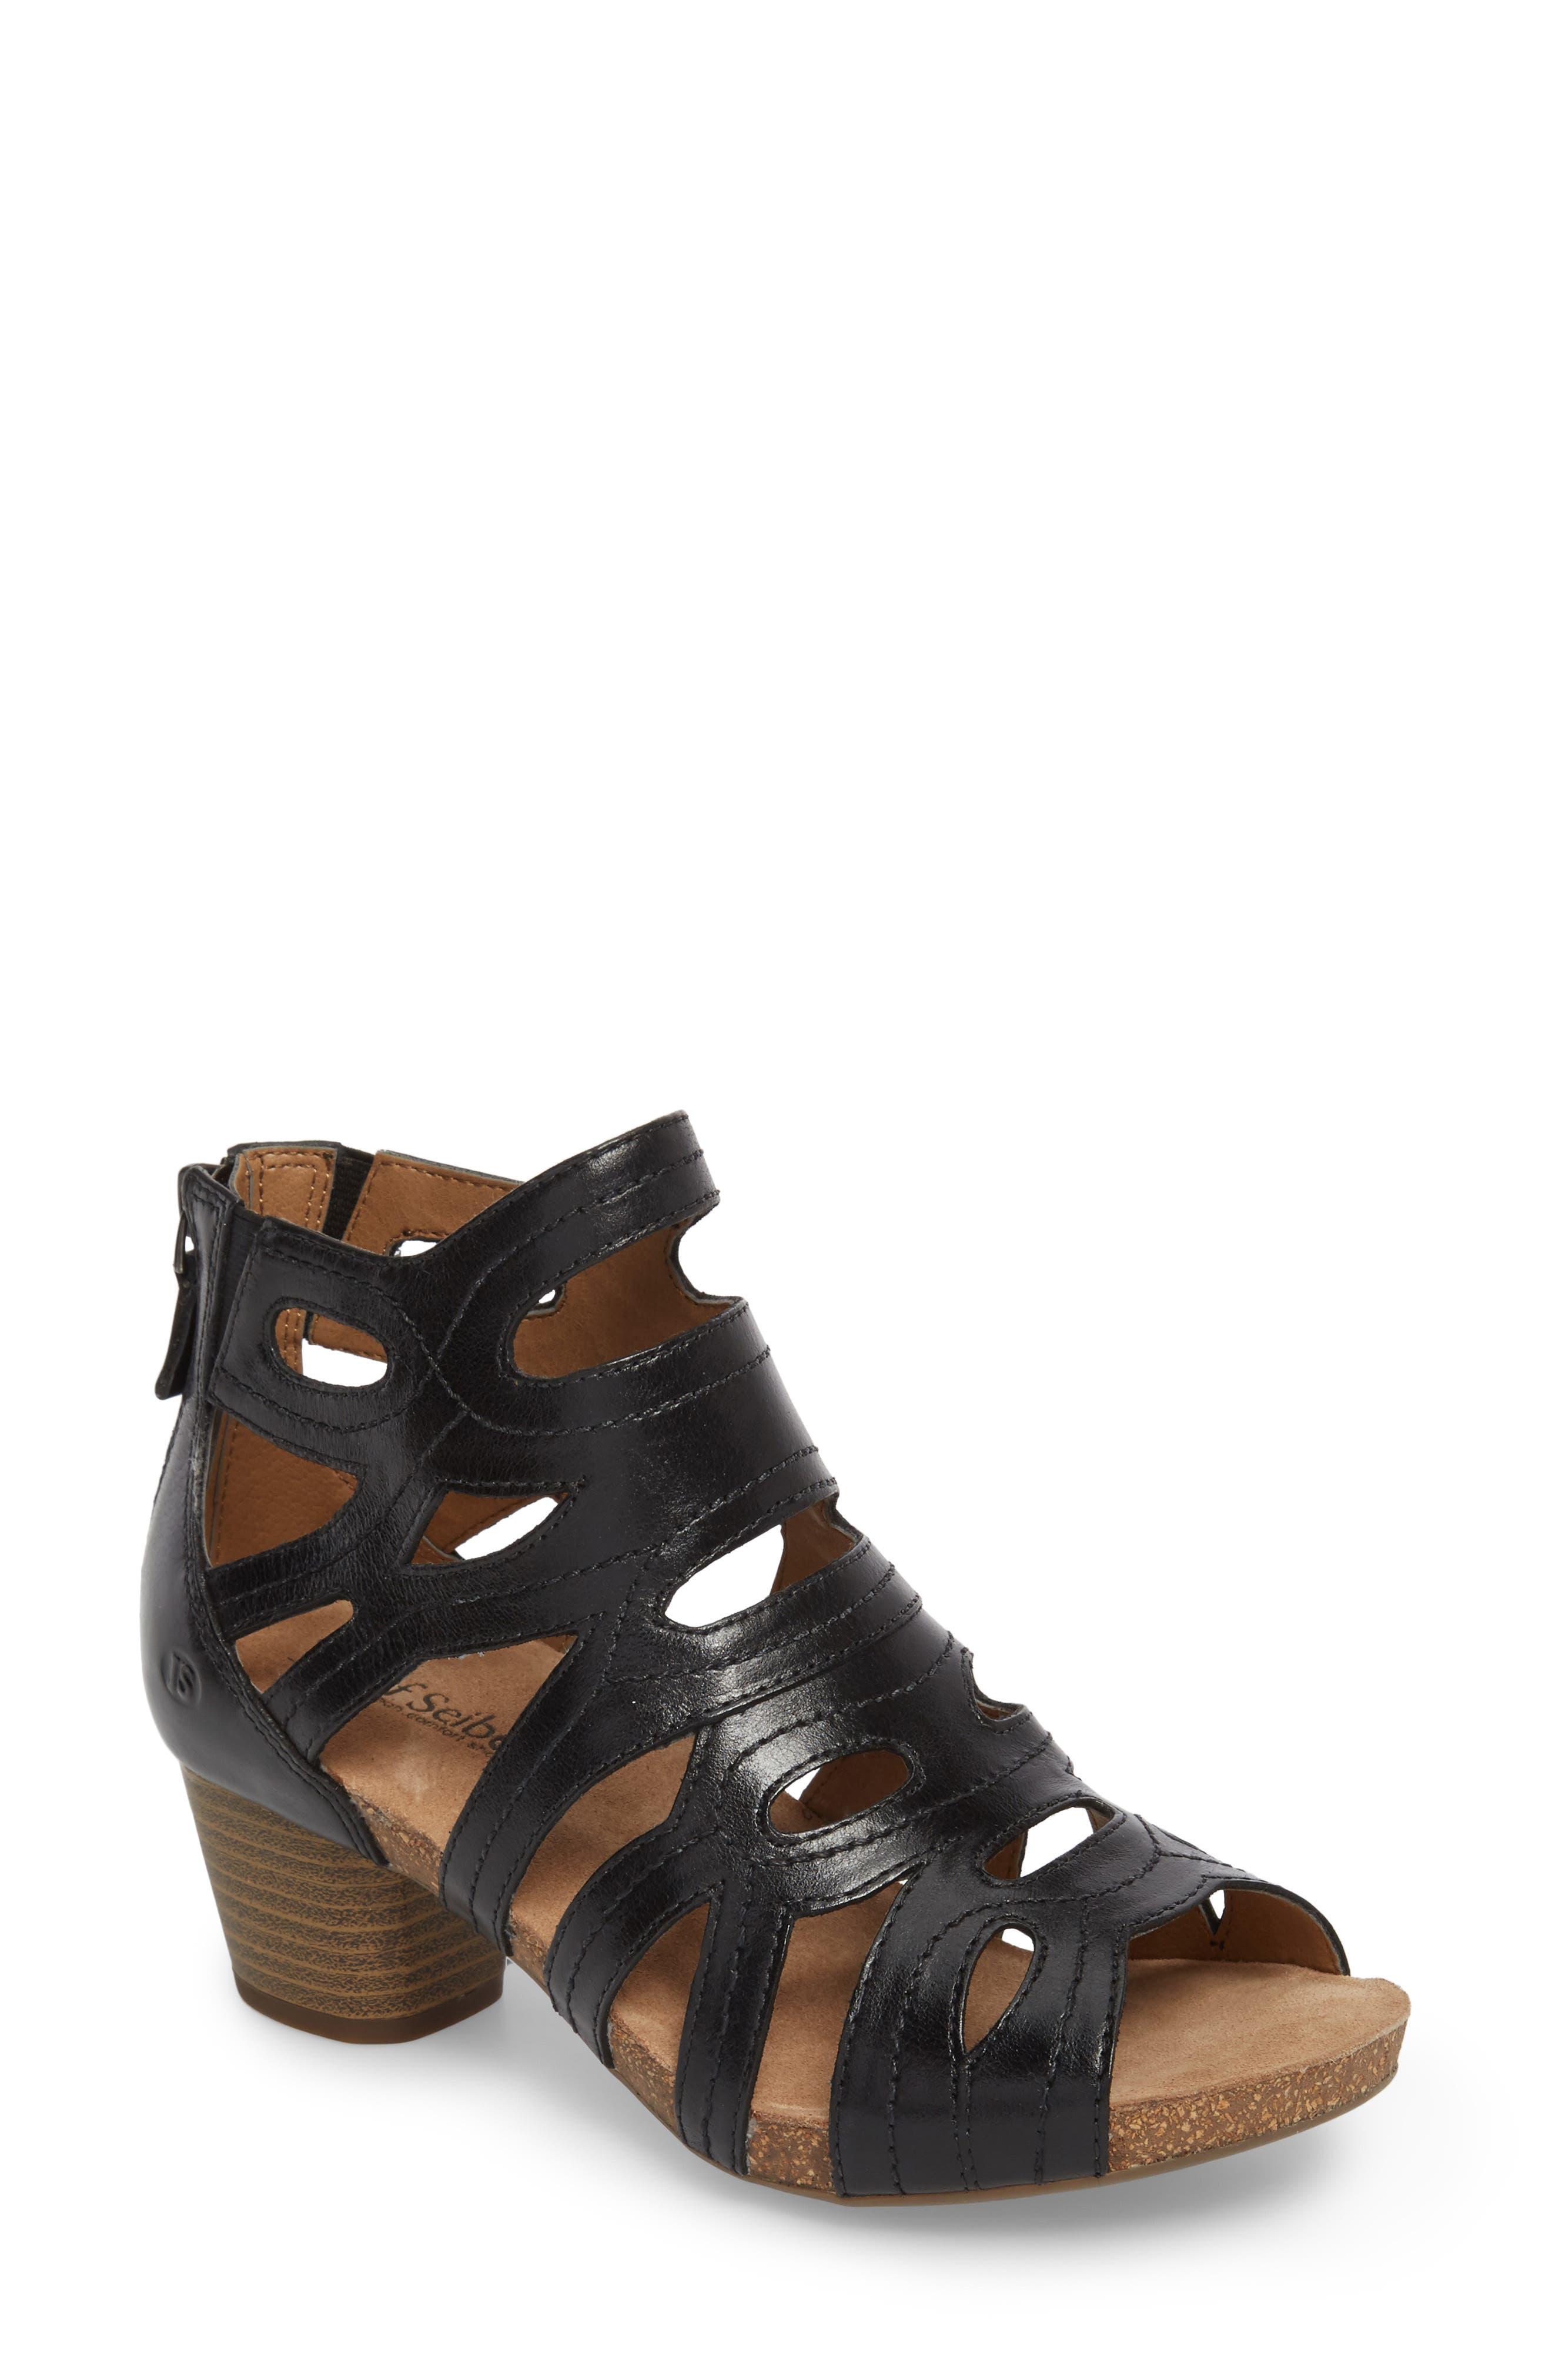 Rose 21 Gladiator Sandal,                             Main thumbnail 1, color,                             BLACK LEATHER